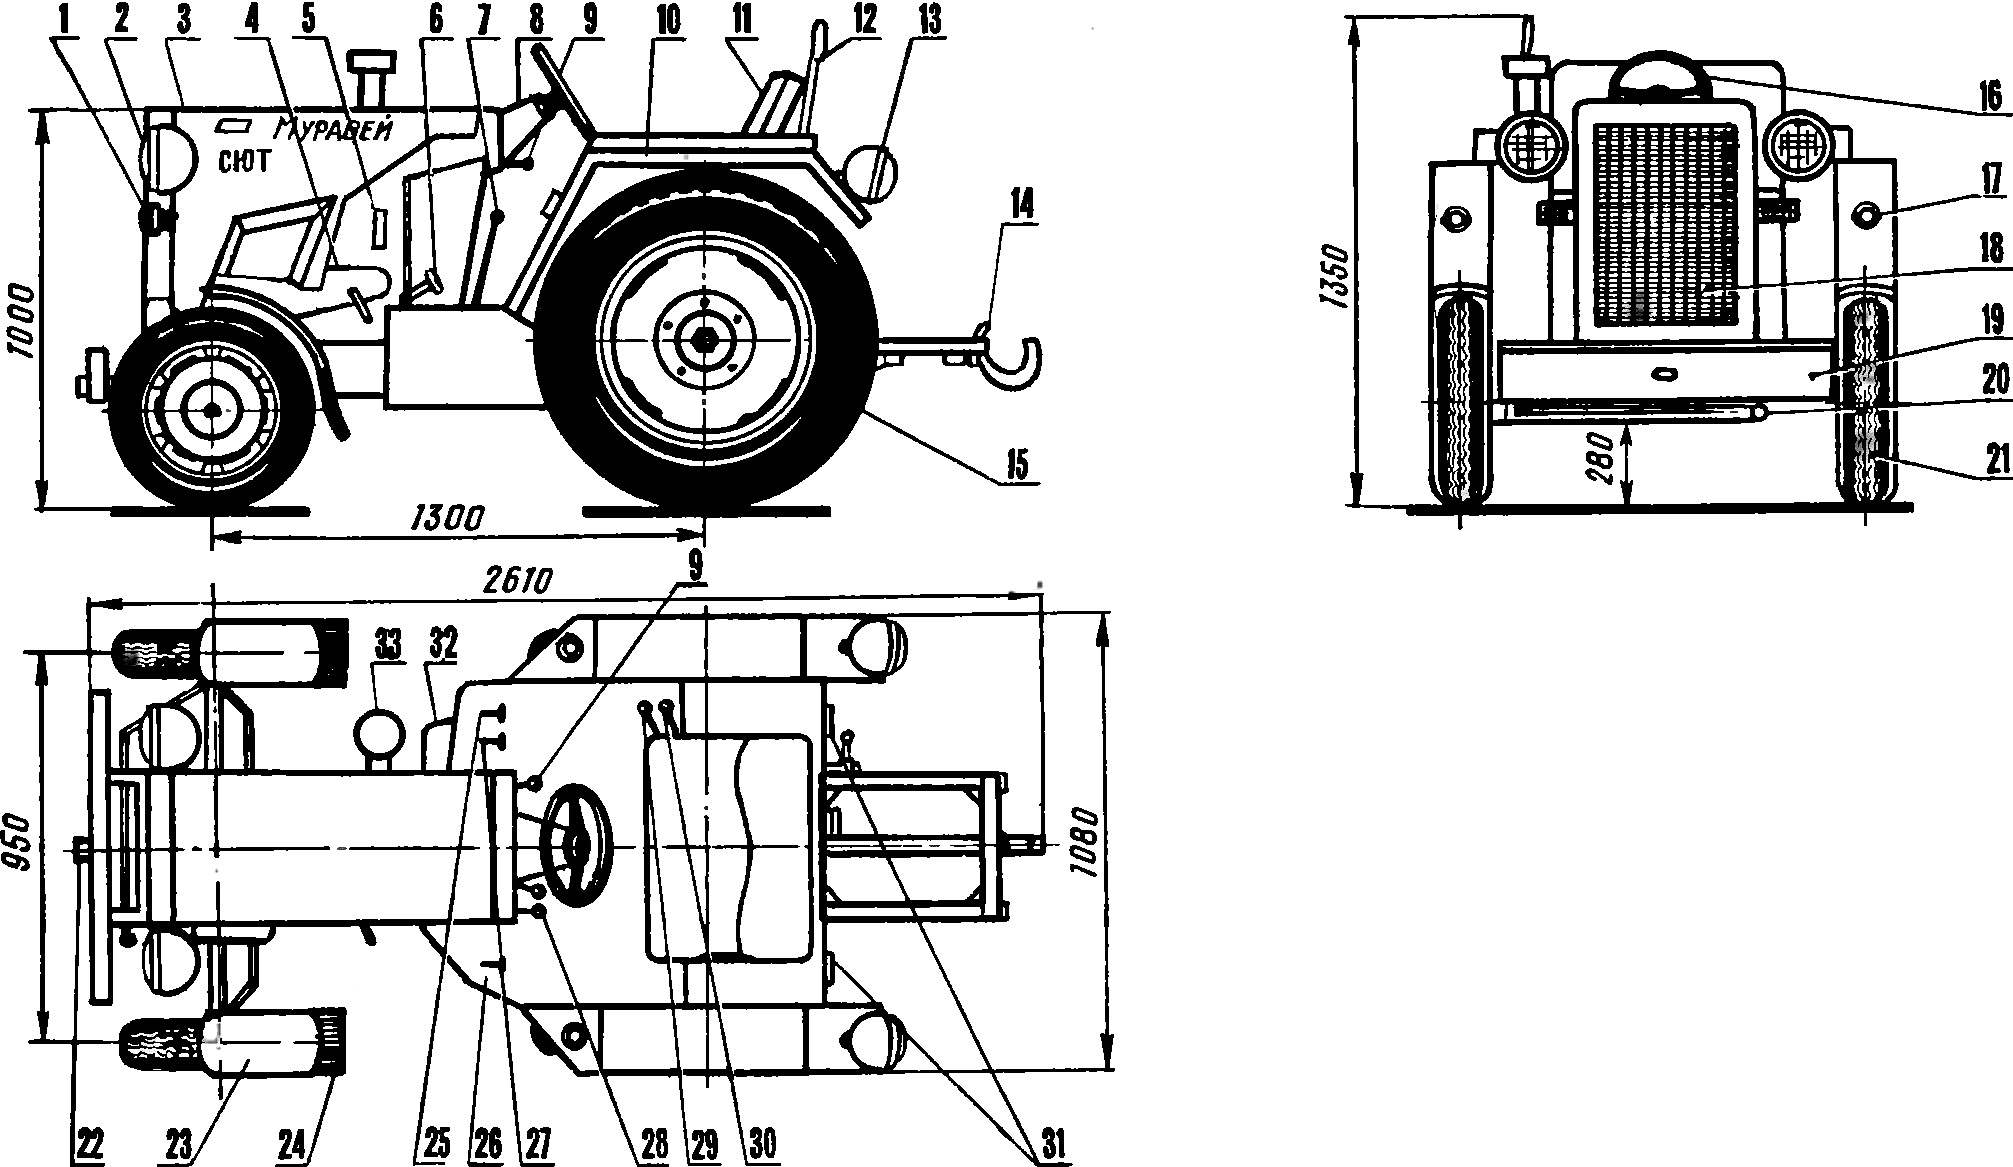 Рис. 1. Компоновка мини-трактора «Муравей».